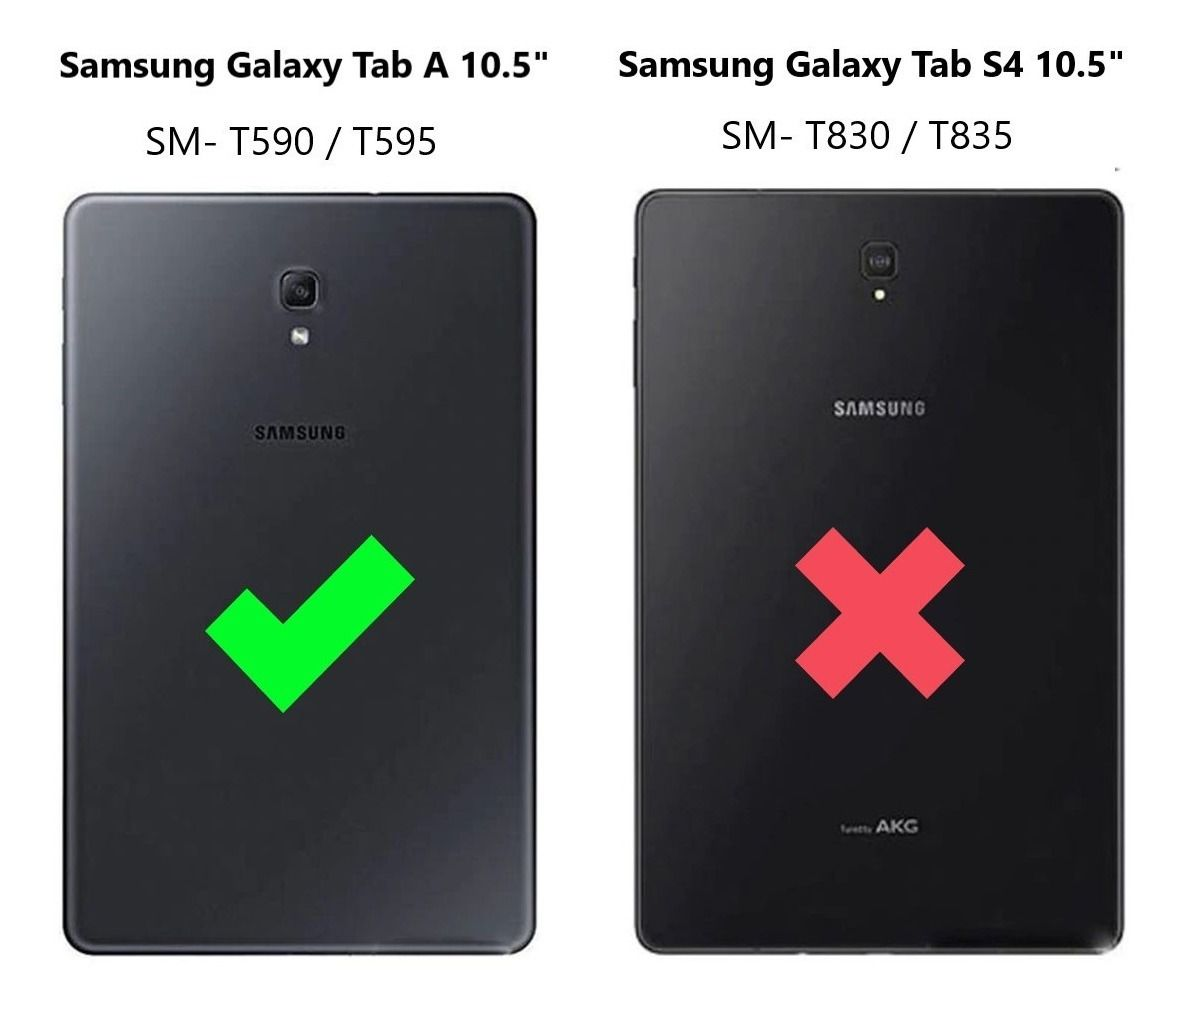 Capa Tablet Samsung Galaxy Tab A 10.5 SM-T595 T590 P597 Anti Queda Impacto Choque